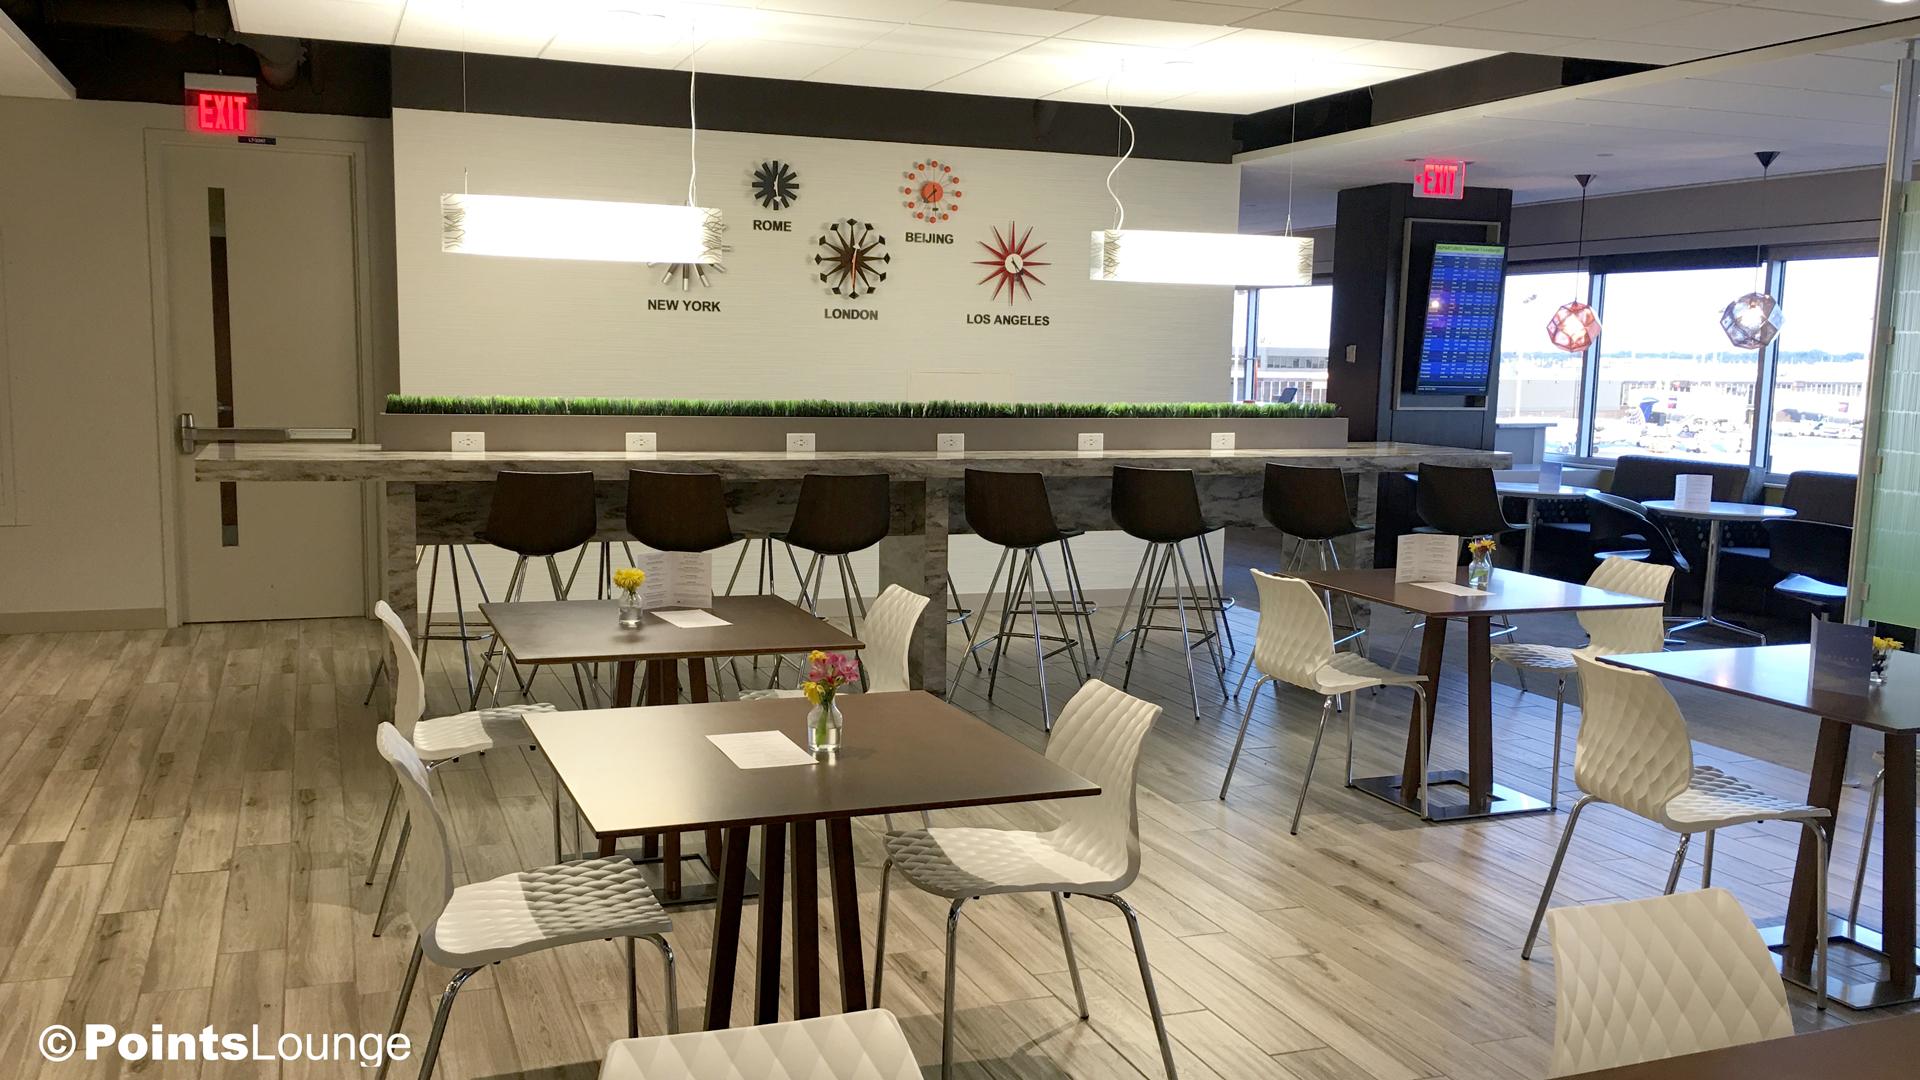 Escape Lounge at Minneapolis-St. Paul International Airport (MSP).